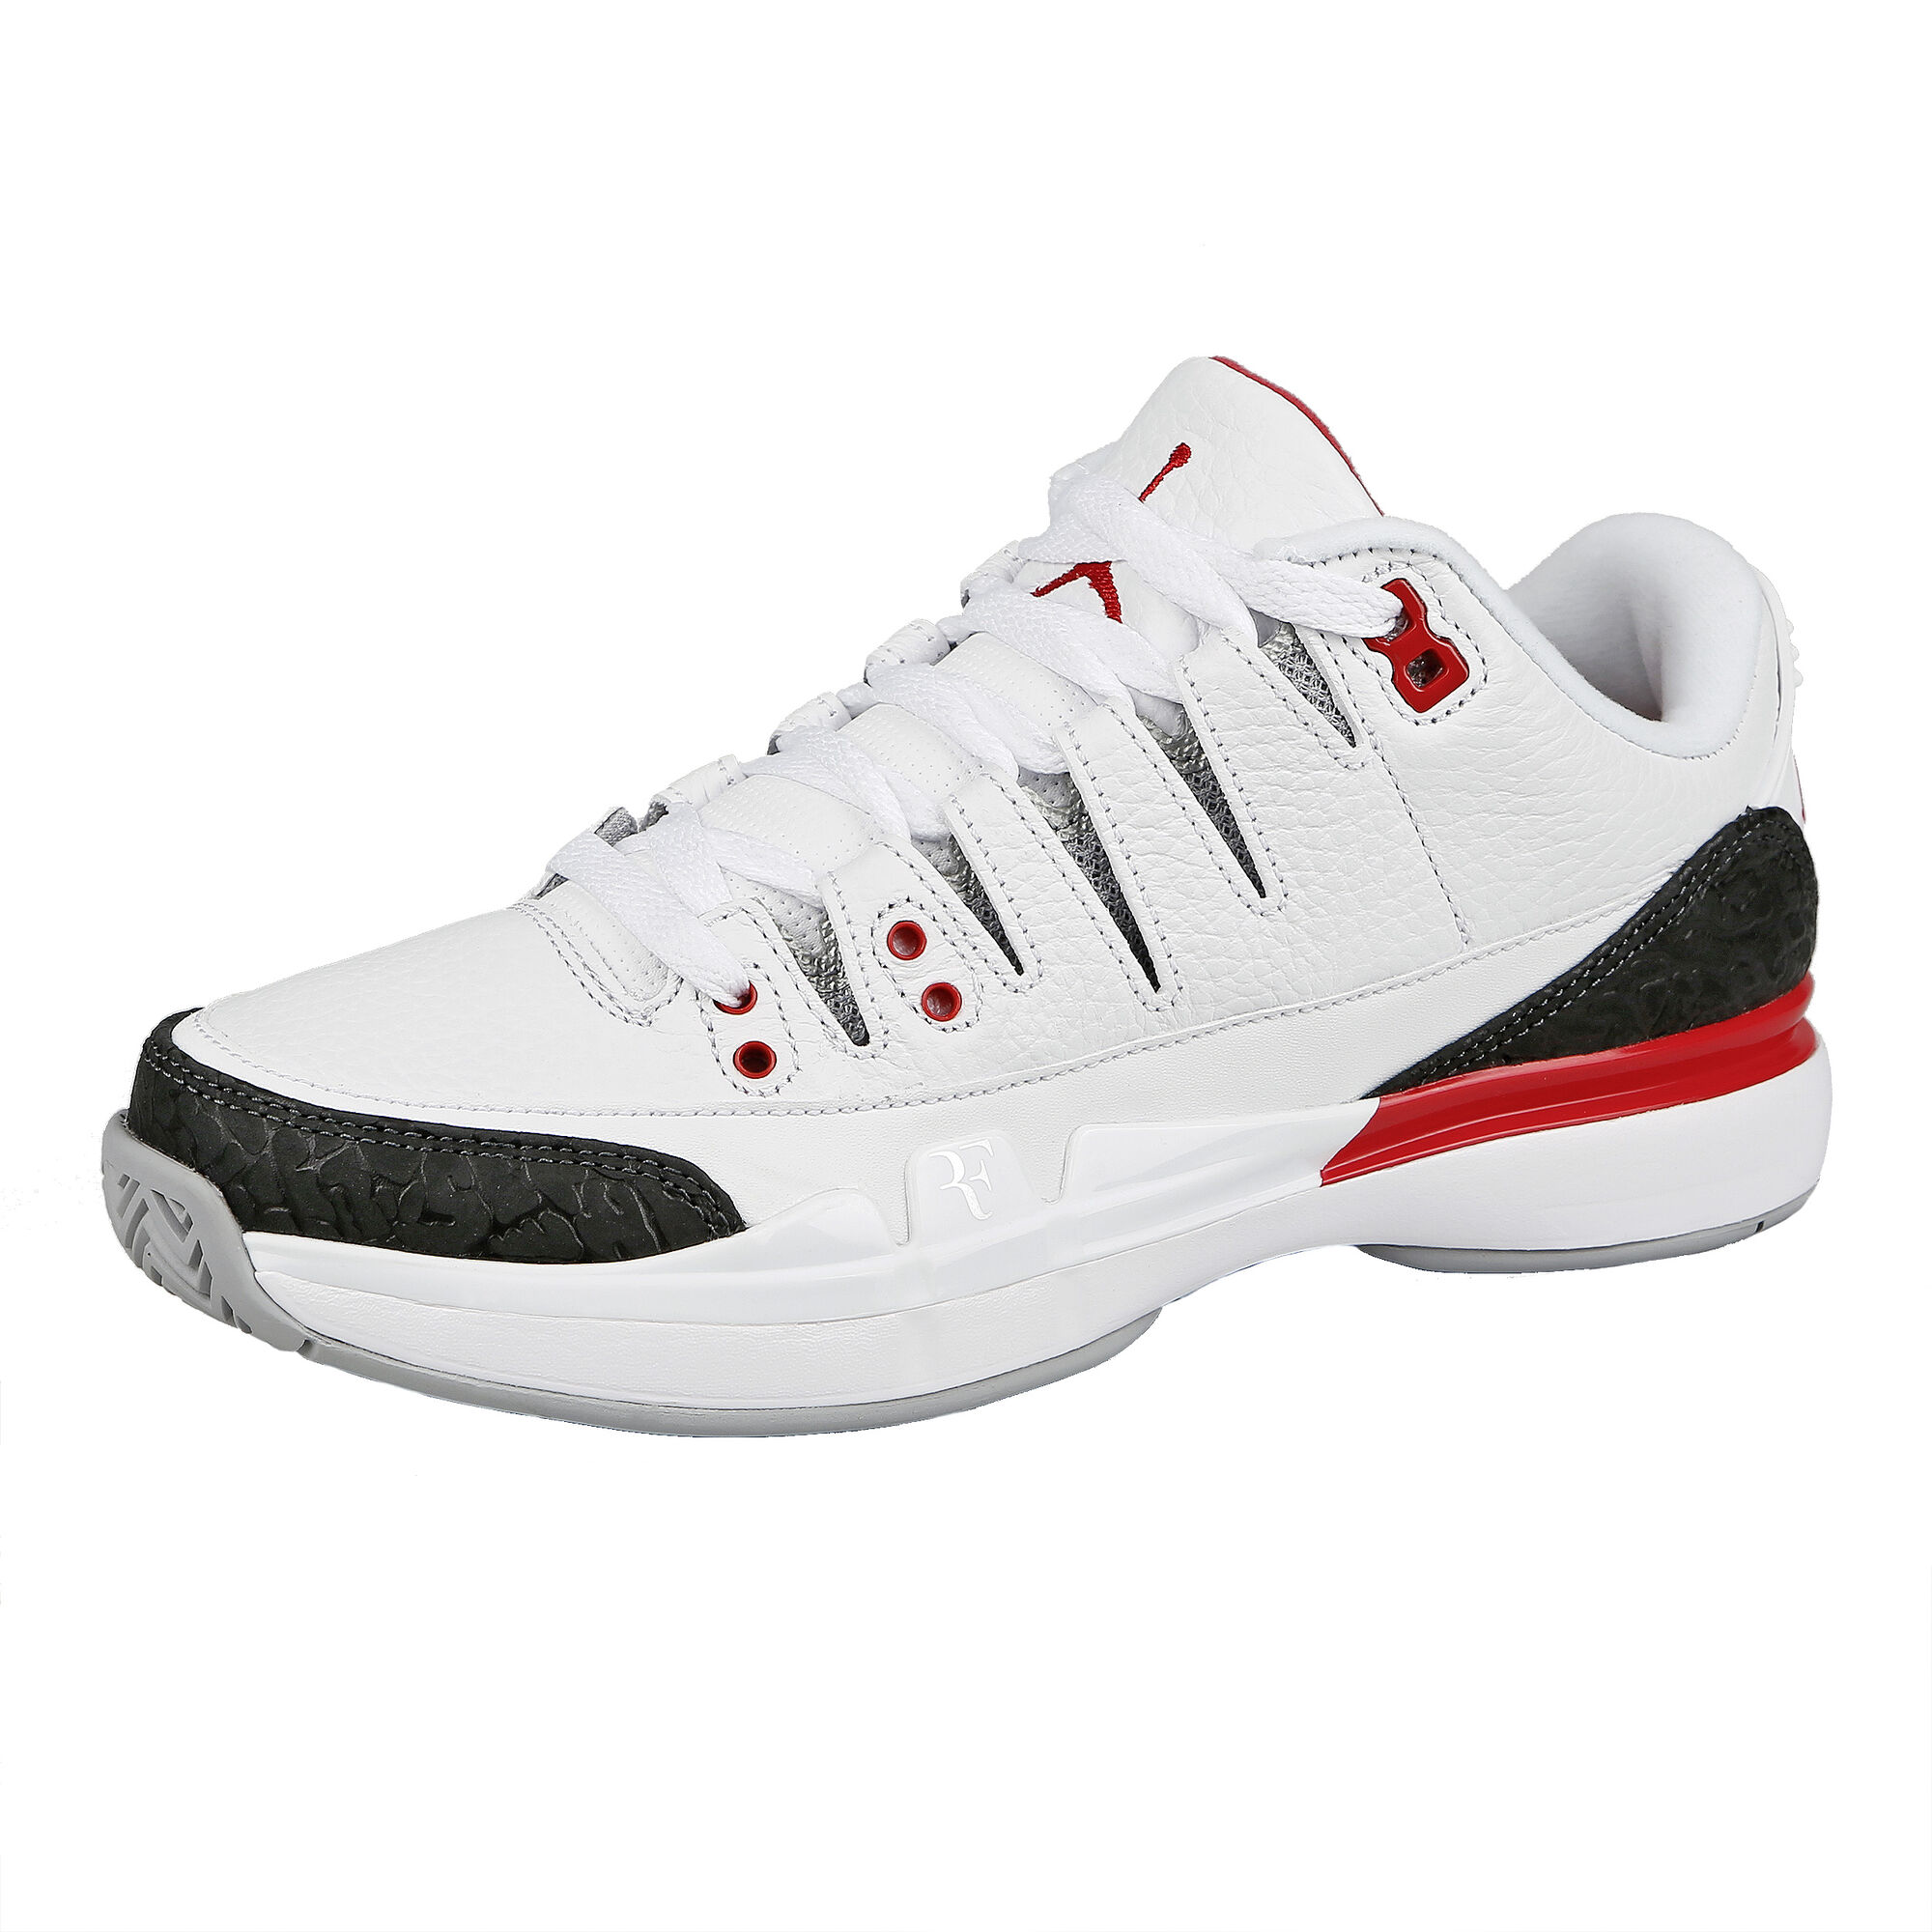 cheaper b9f44 595f2 Nike Roger Federer Zoom Vapor Air Jordan 3 Chaussure Tout Terrain Hommes -  Blanc , Noir